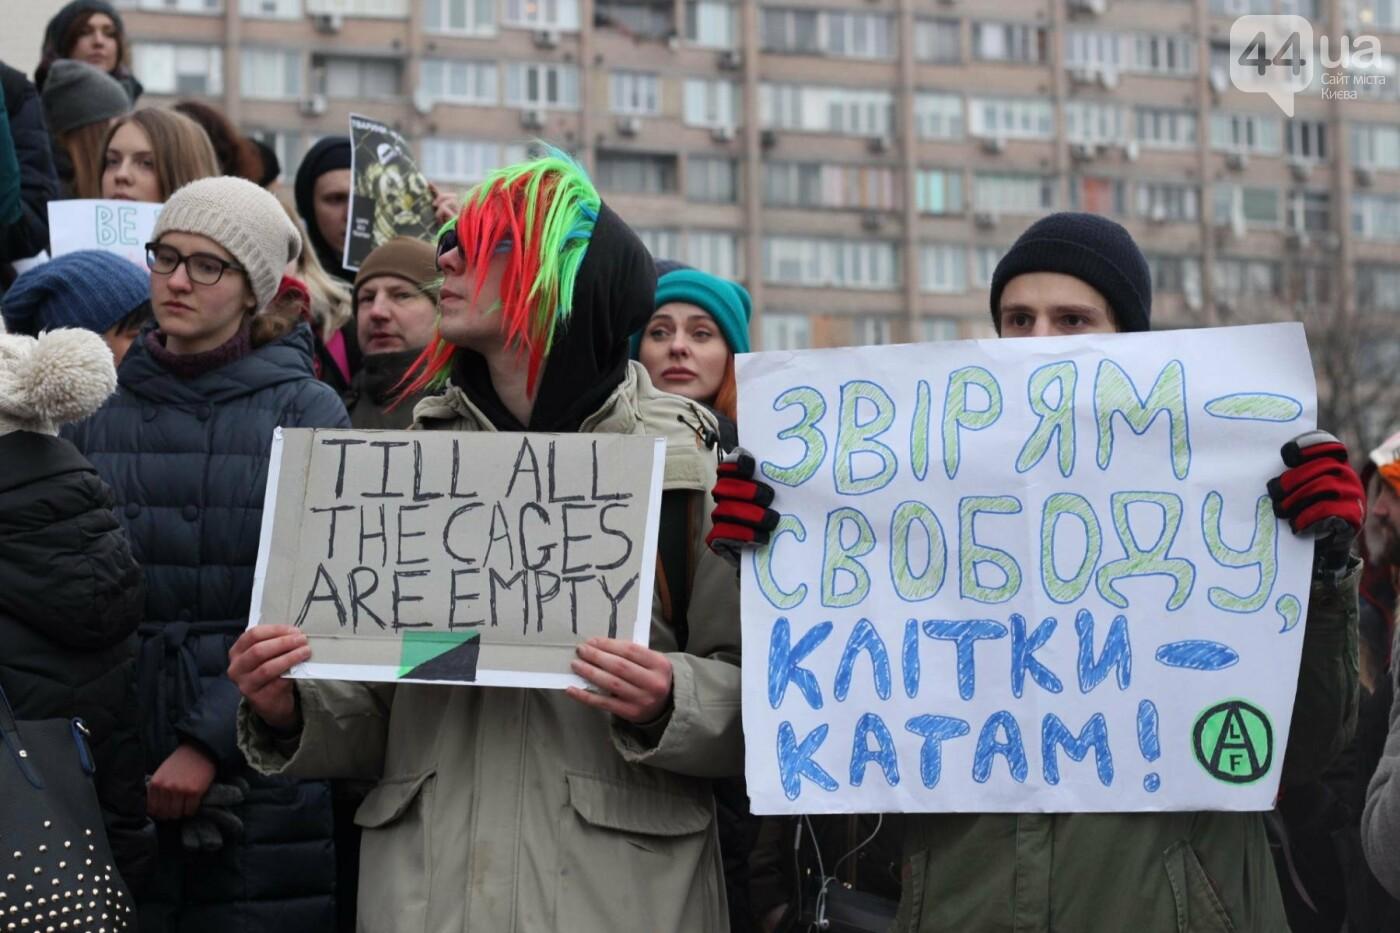 Цирк без животных: как в Киеве прошла акция протеста, фото-40